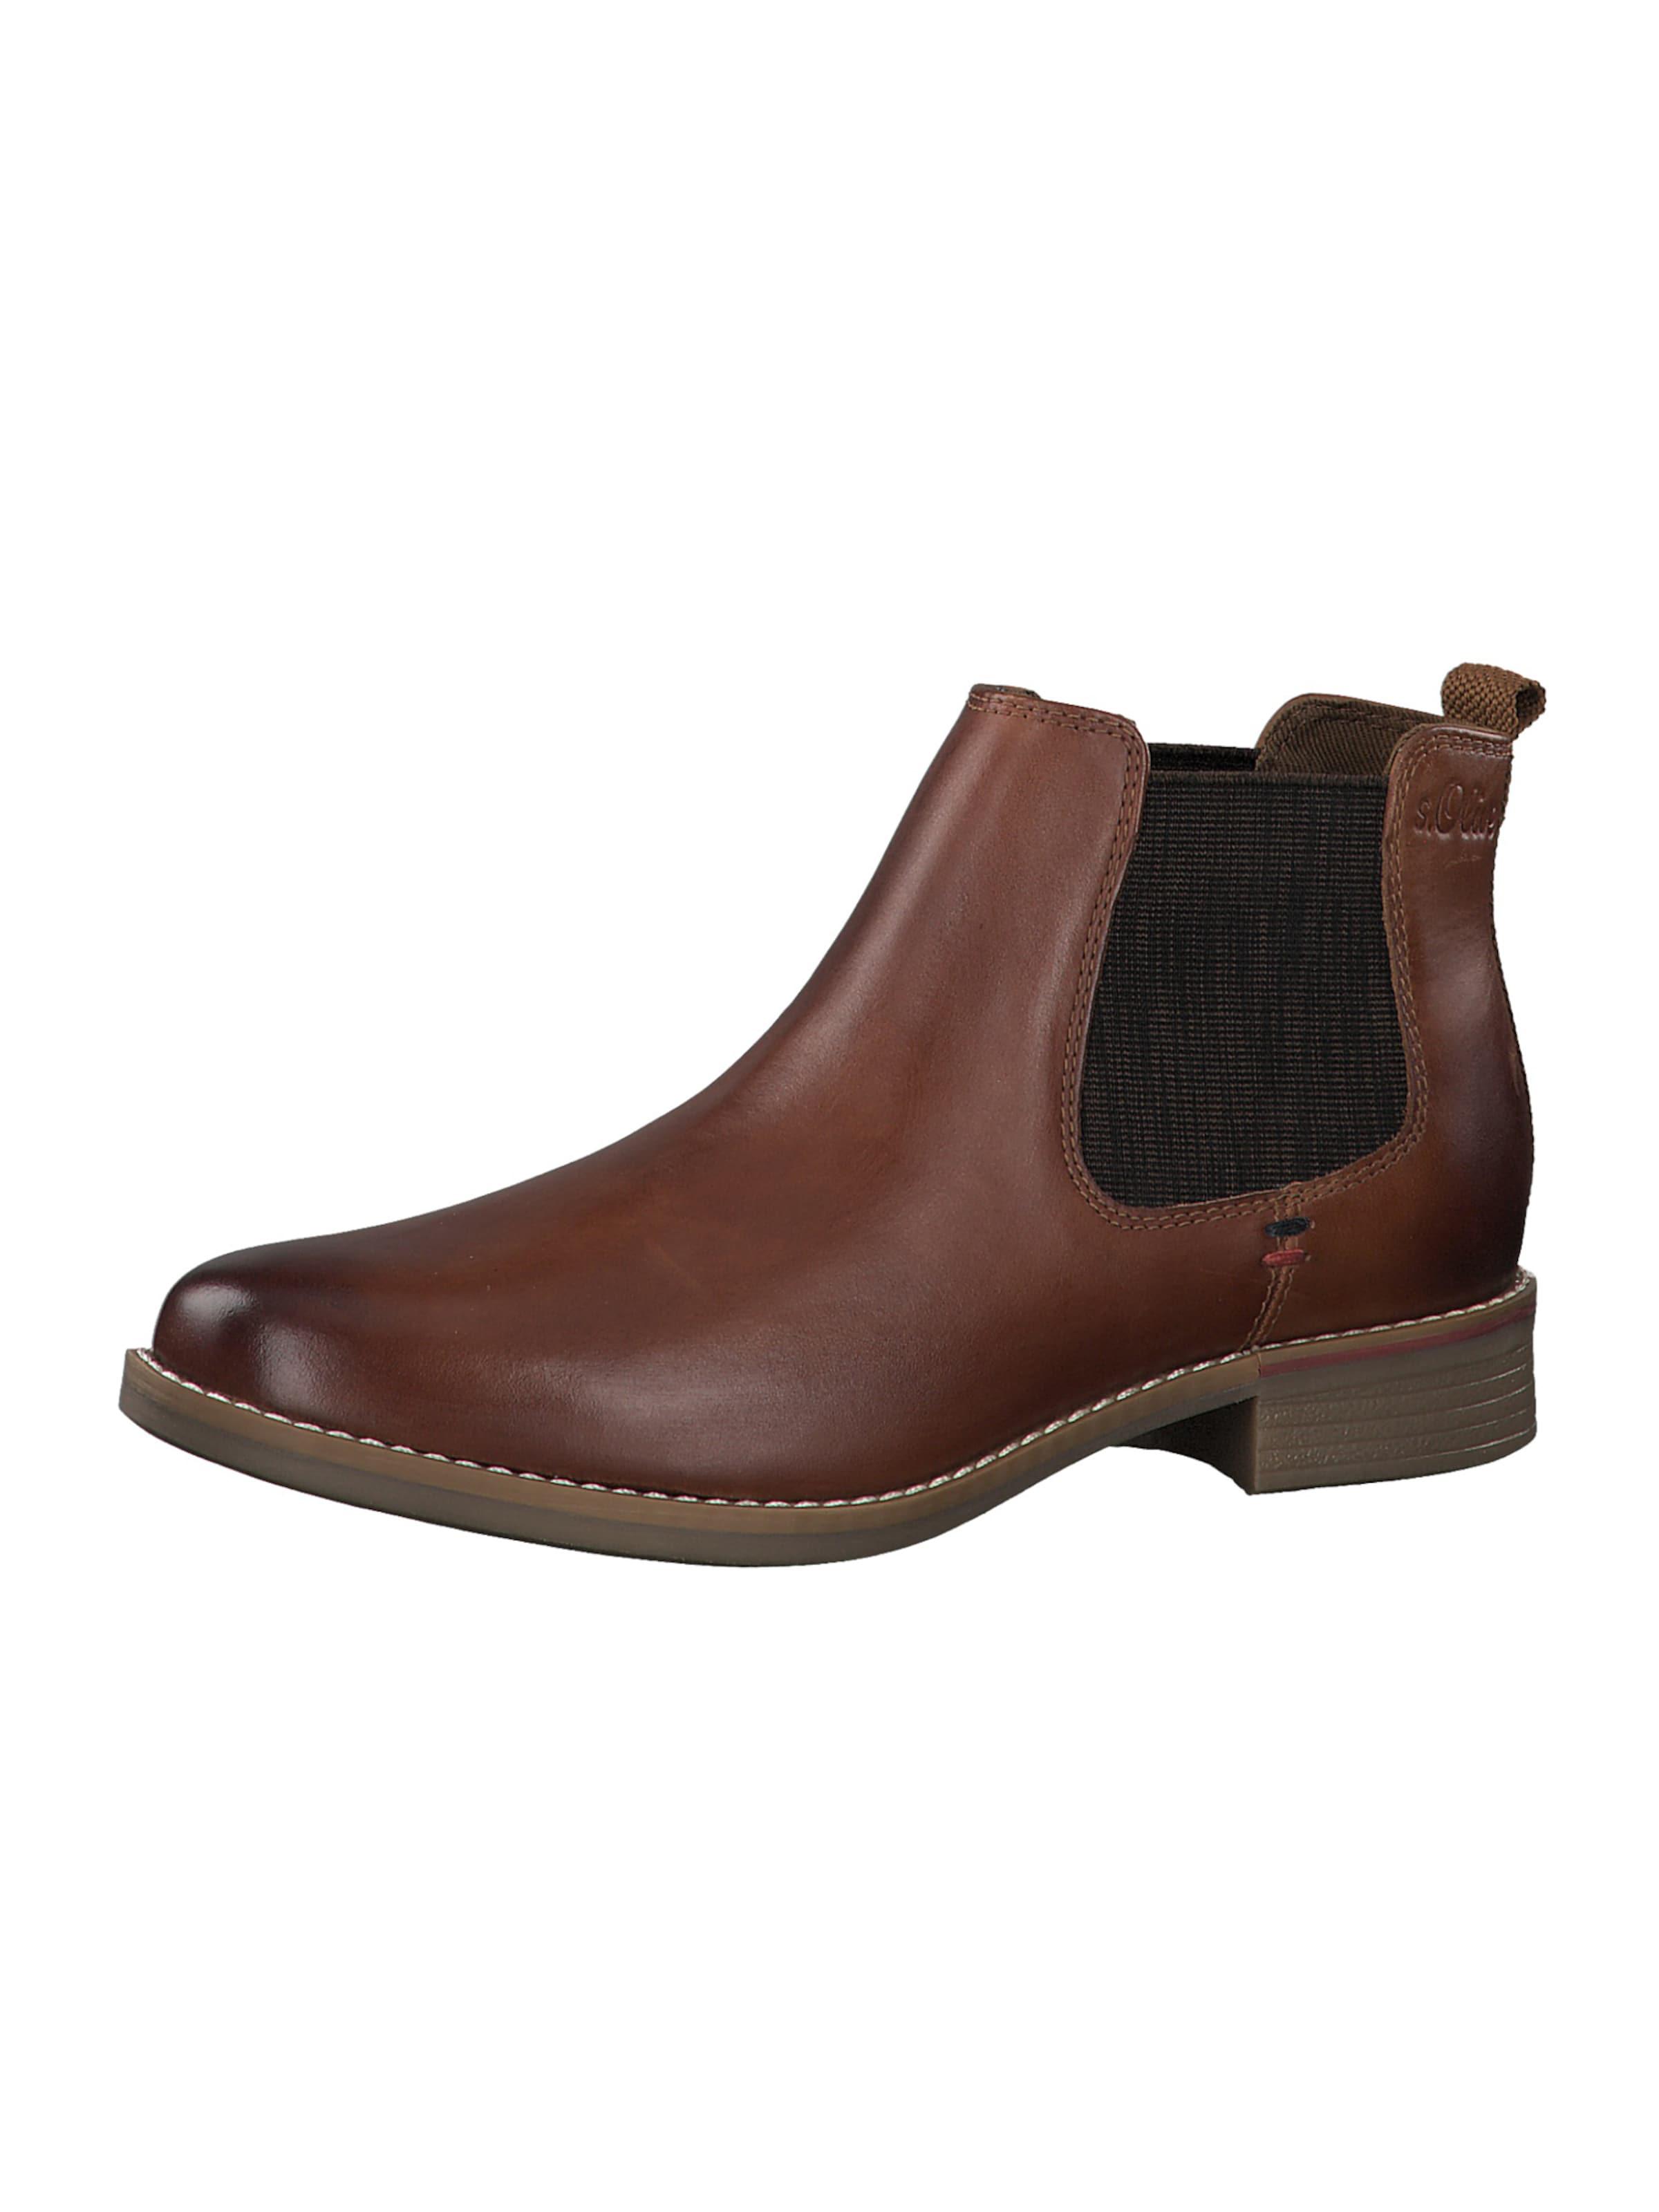 s.Oliver Chelsea boots i konjak